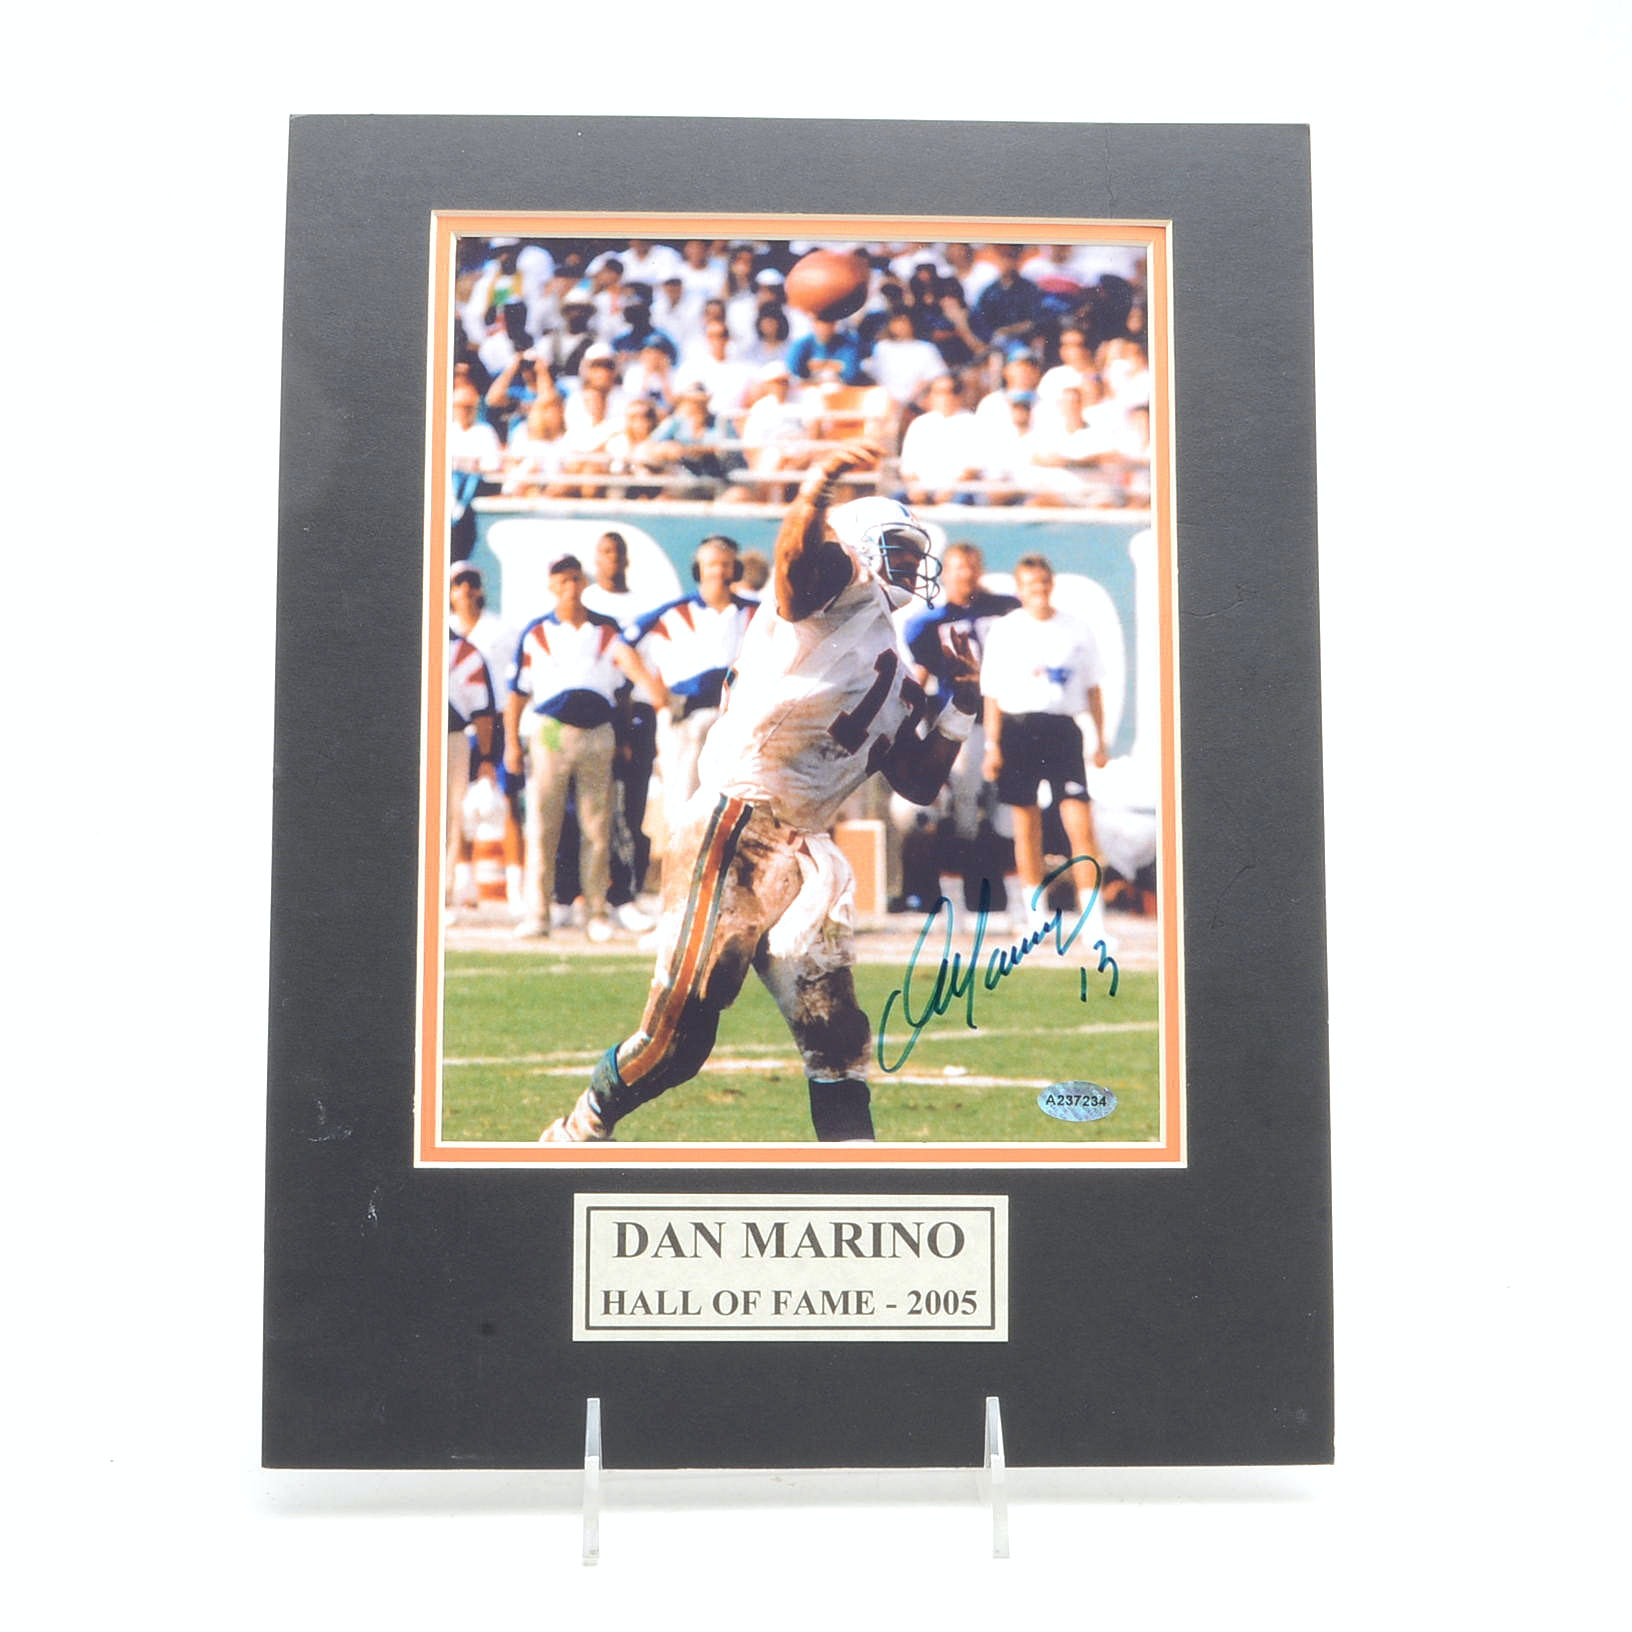 Dan Marino Autographed Miami Dolphins Football Photo